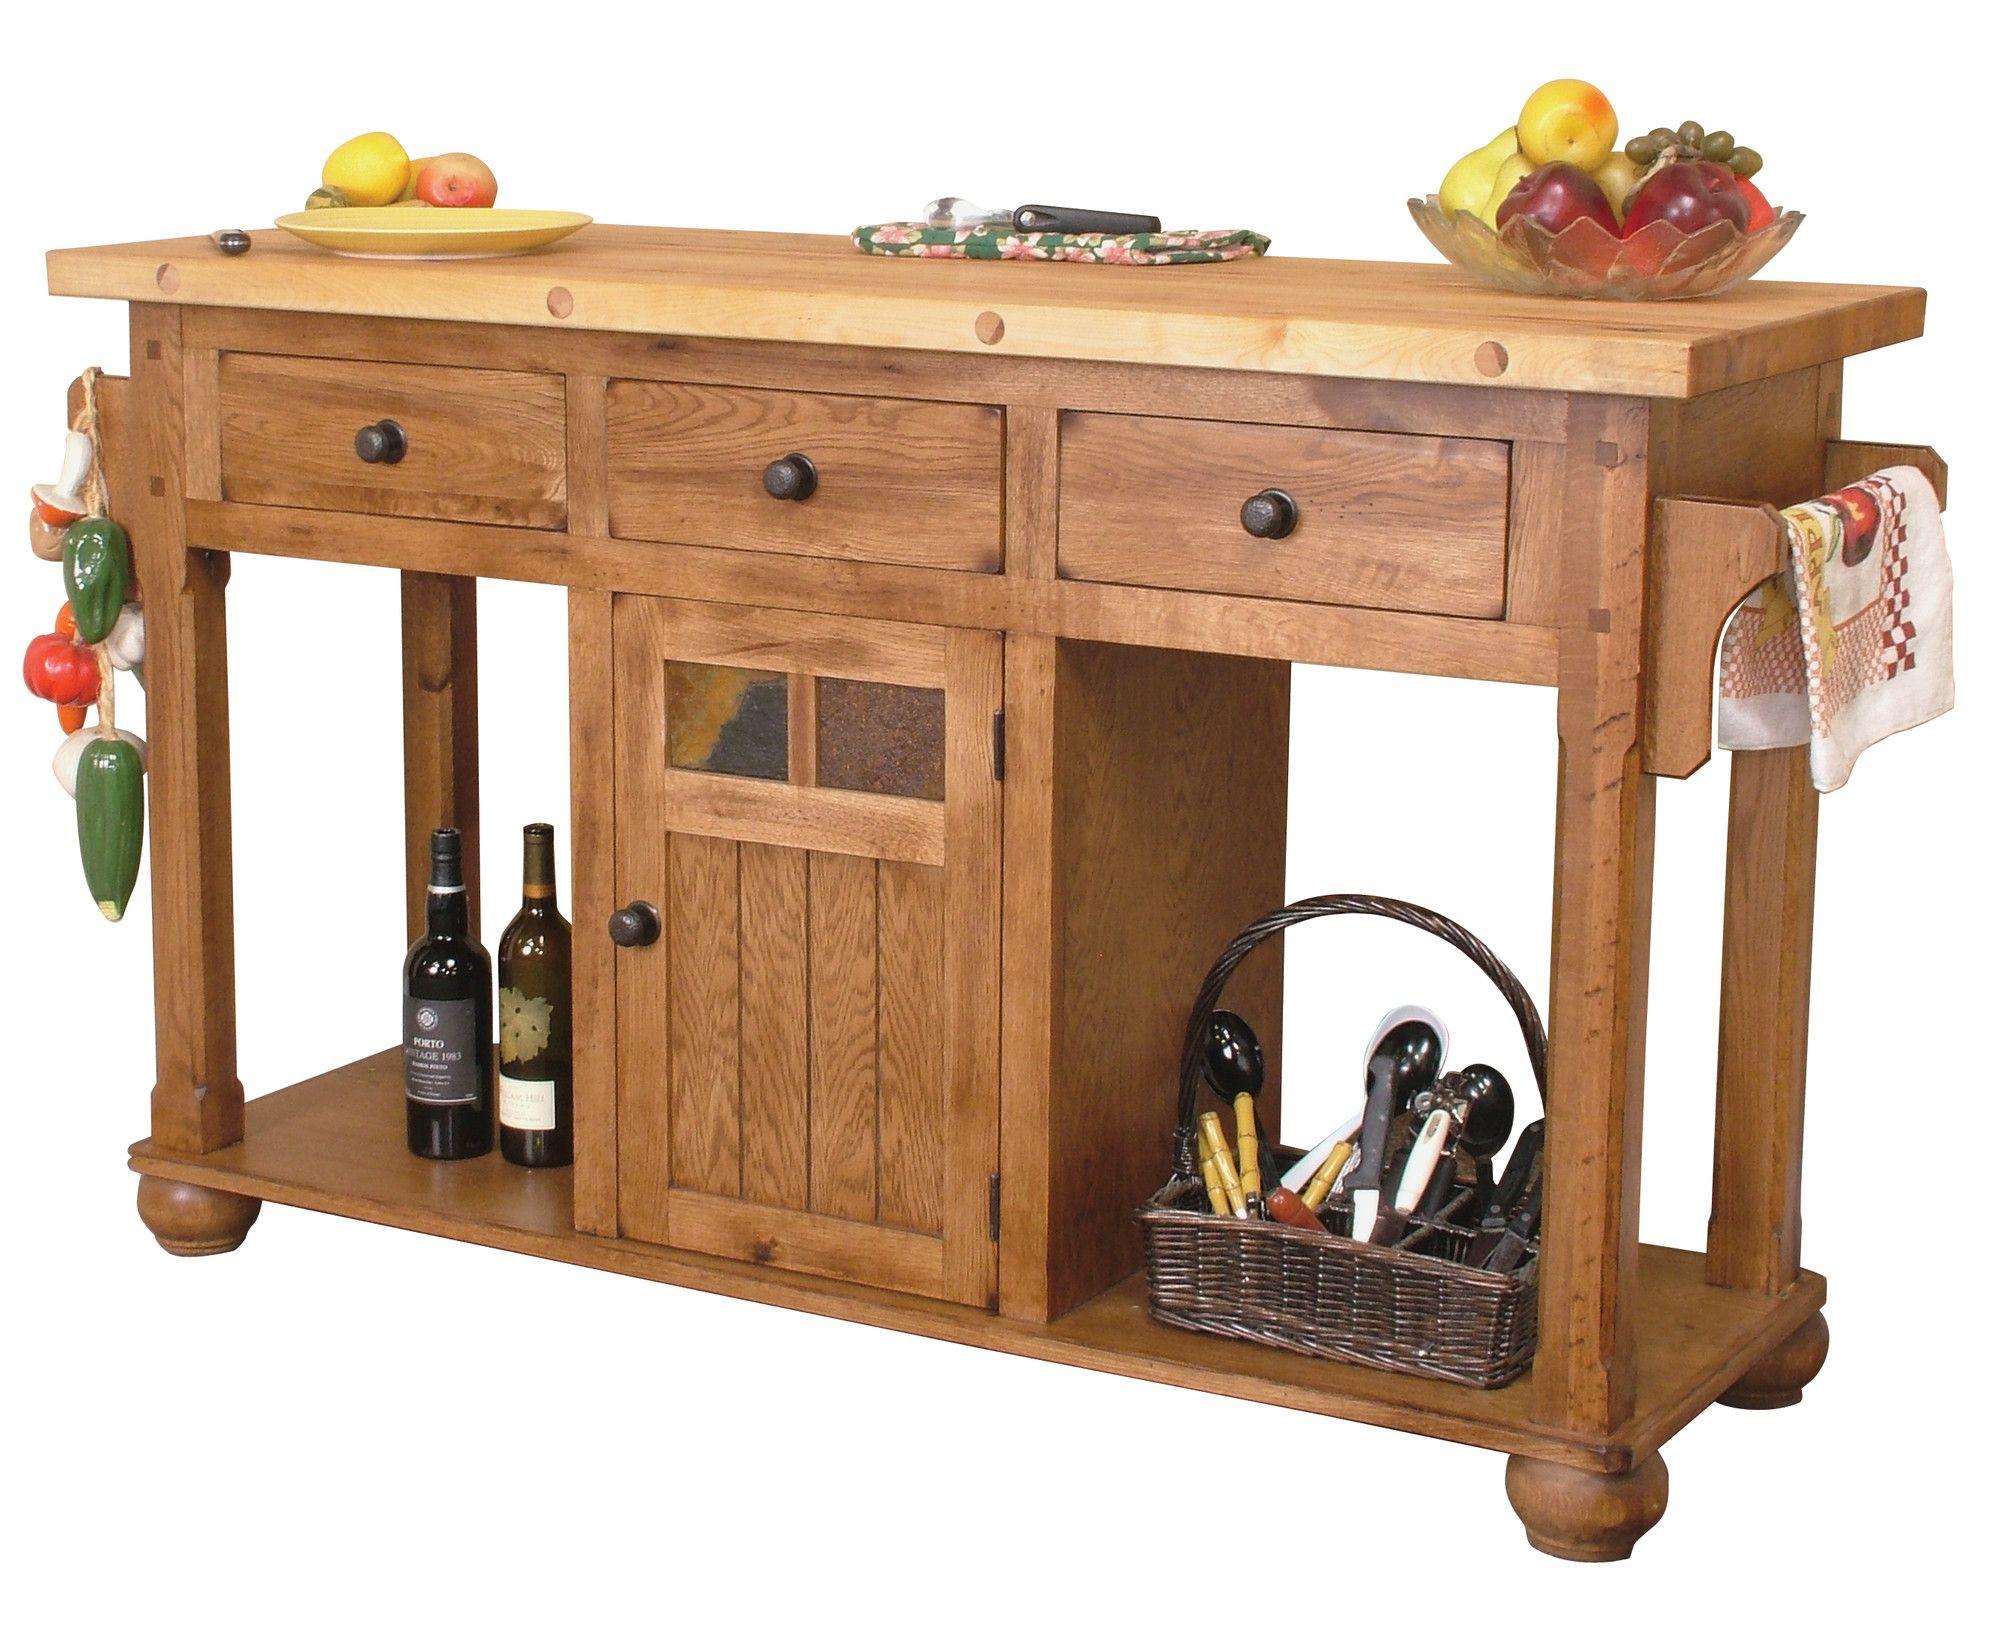 Lovely Sunny Designs Sedona Kitchen Island U0026 Reviews | Wayfair